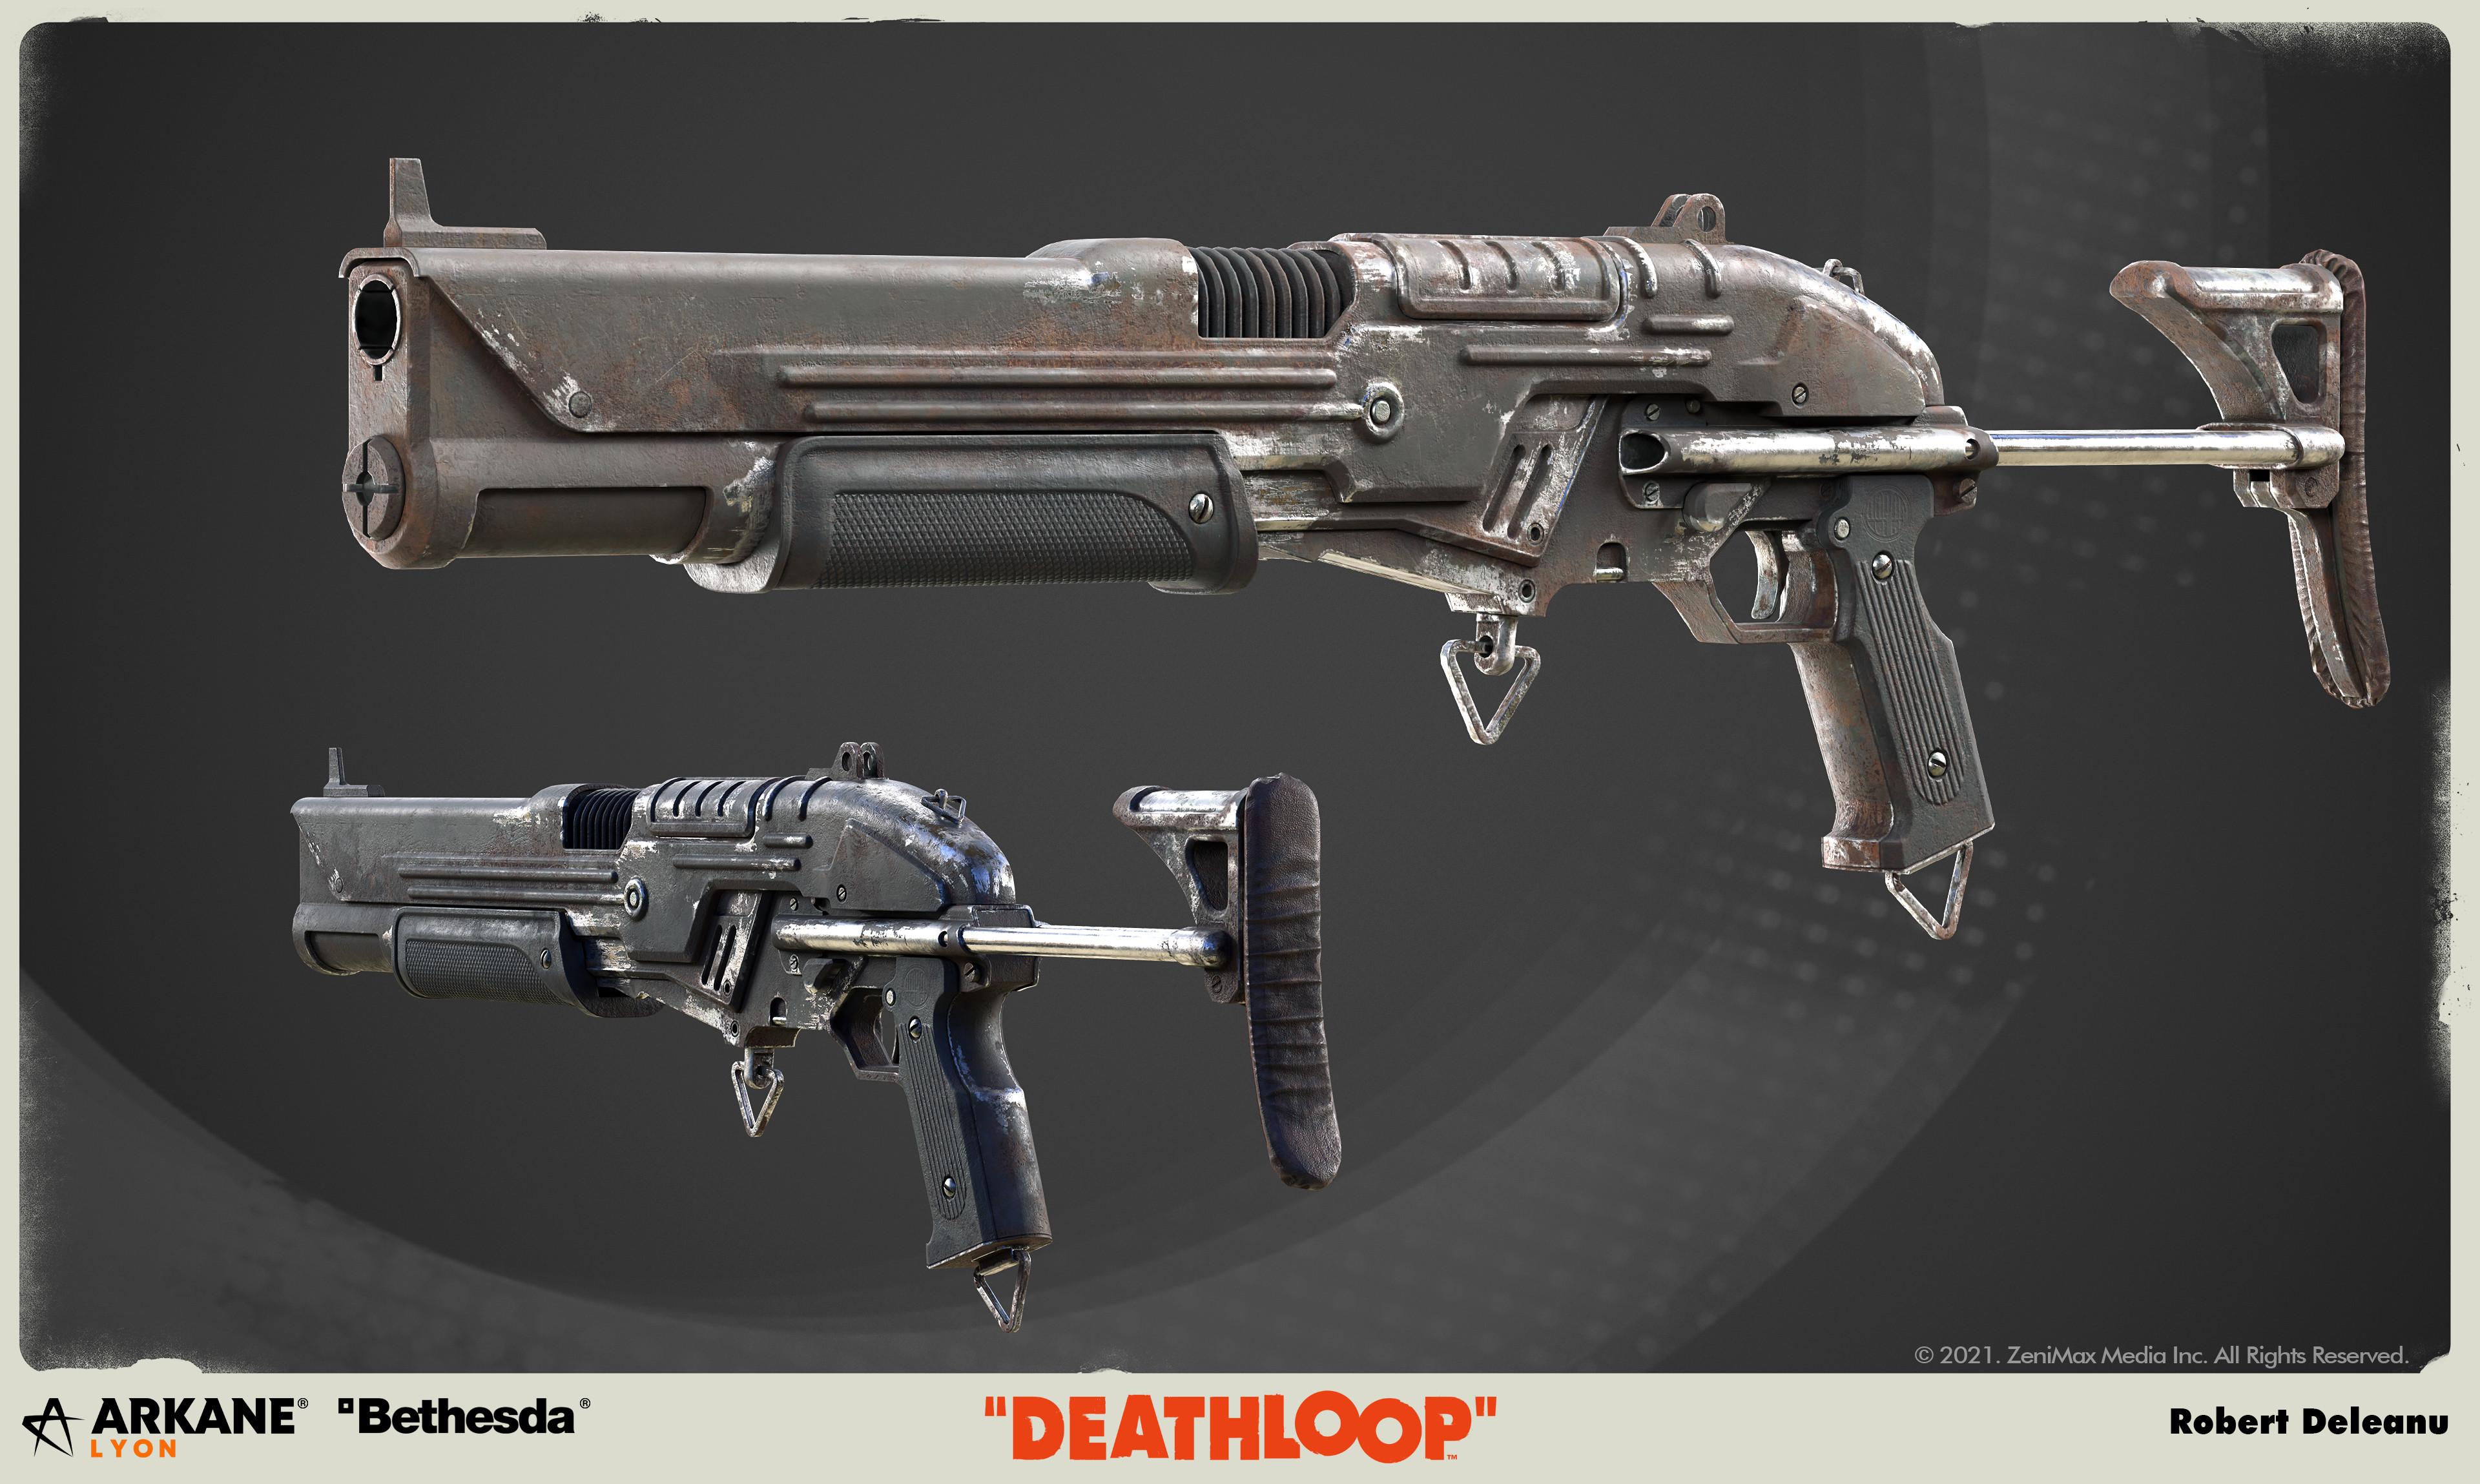 The Vopat Trencher. It's a pump-action shotgun, it rips through enemies lines.